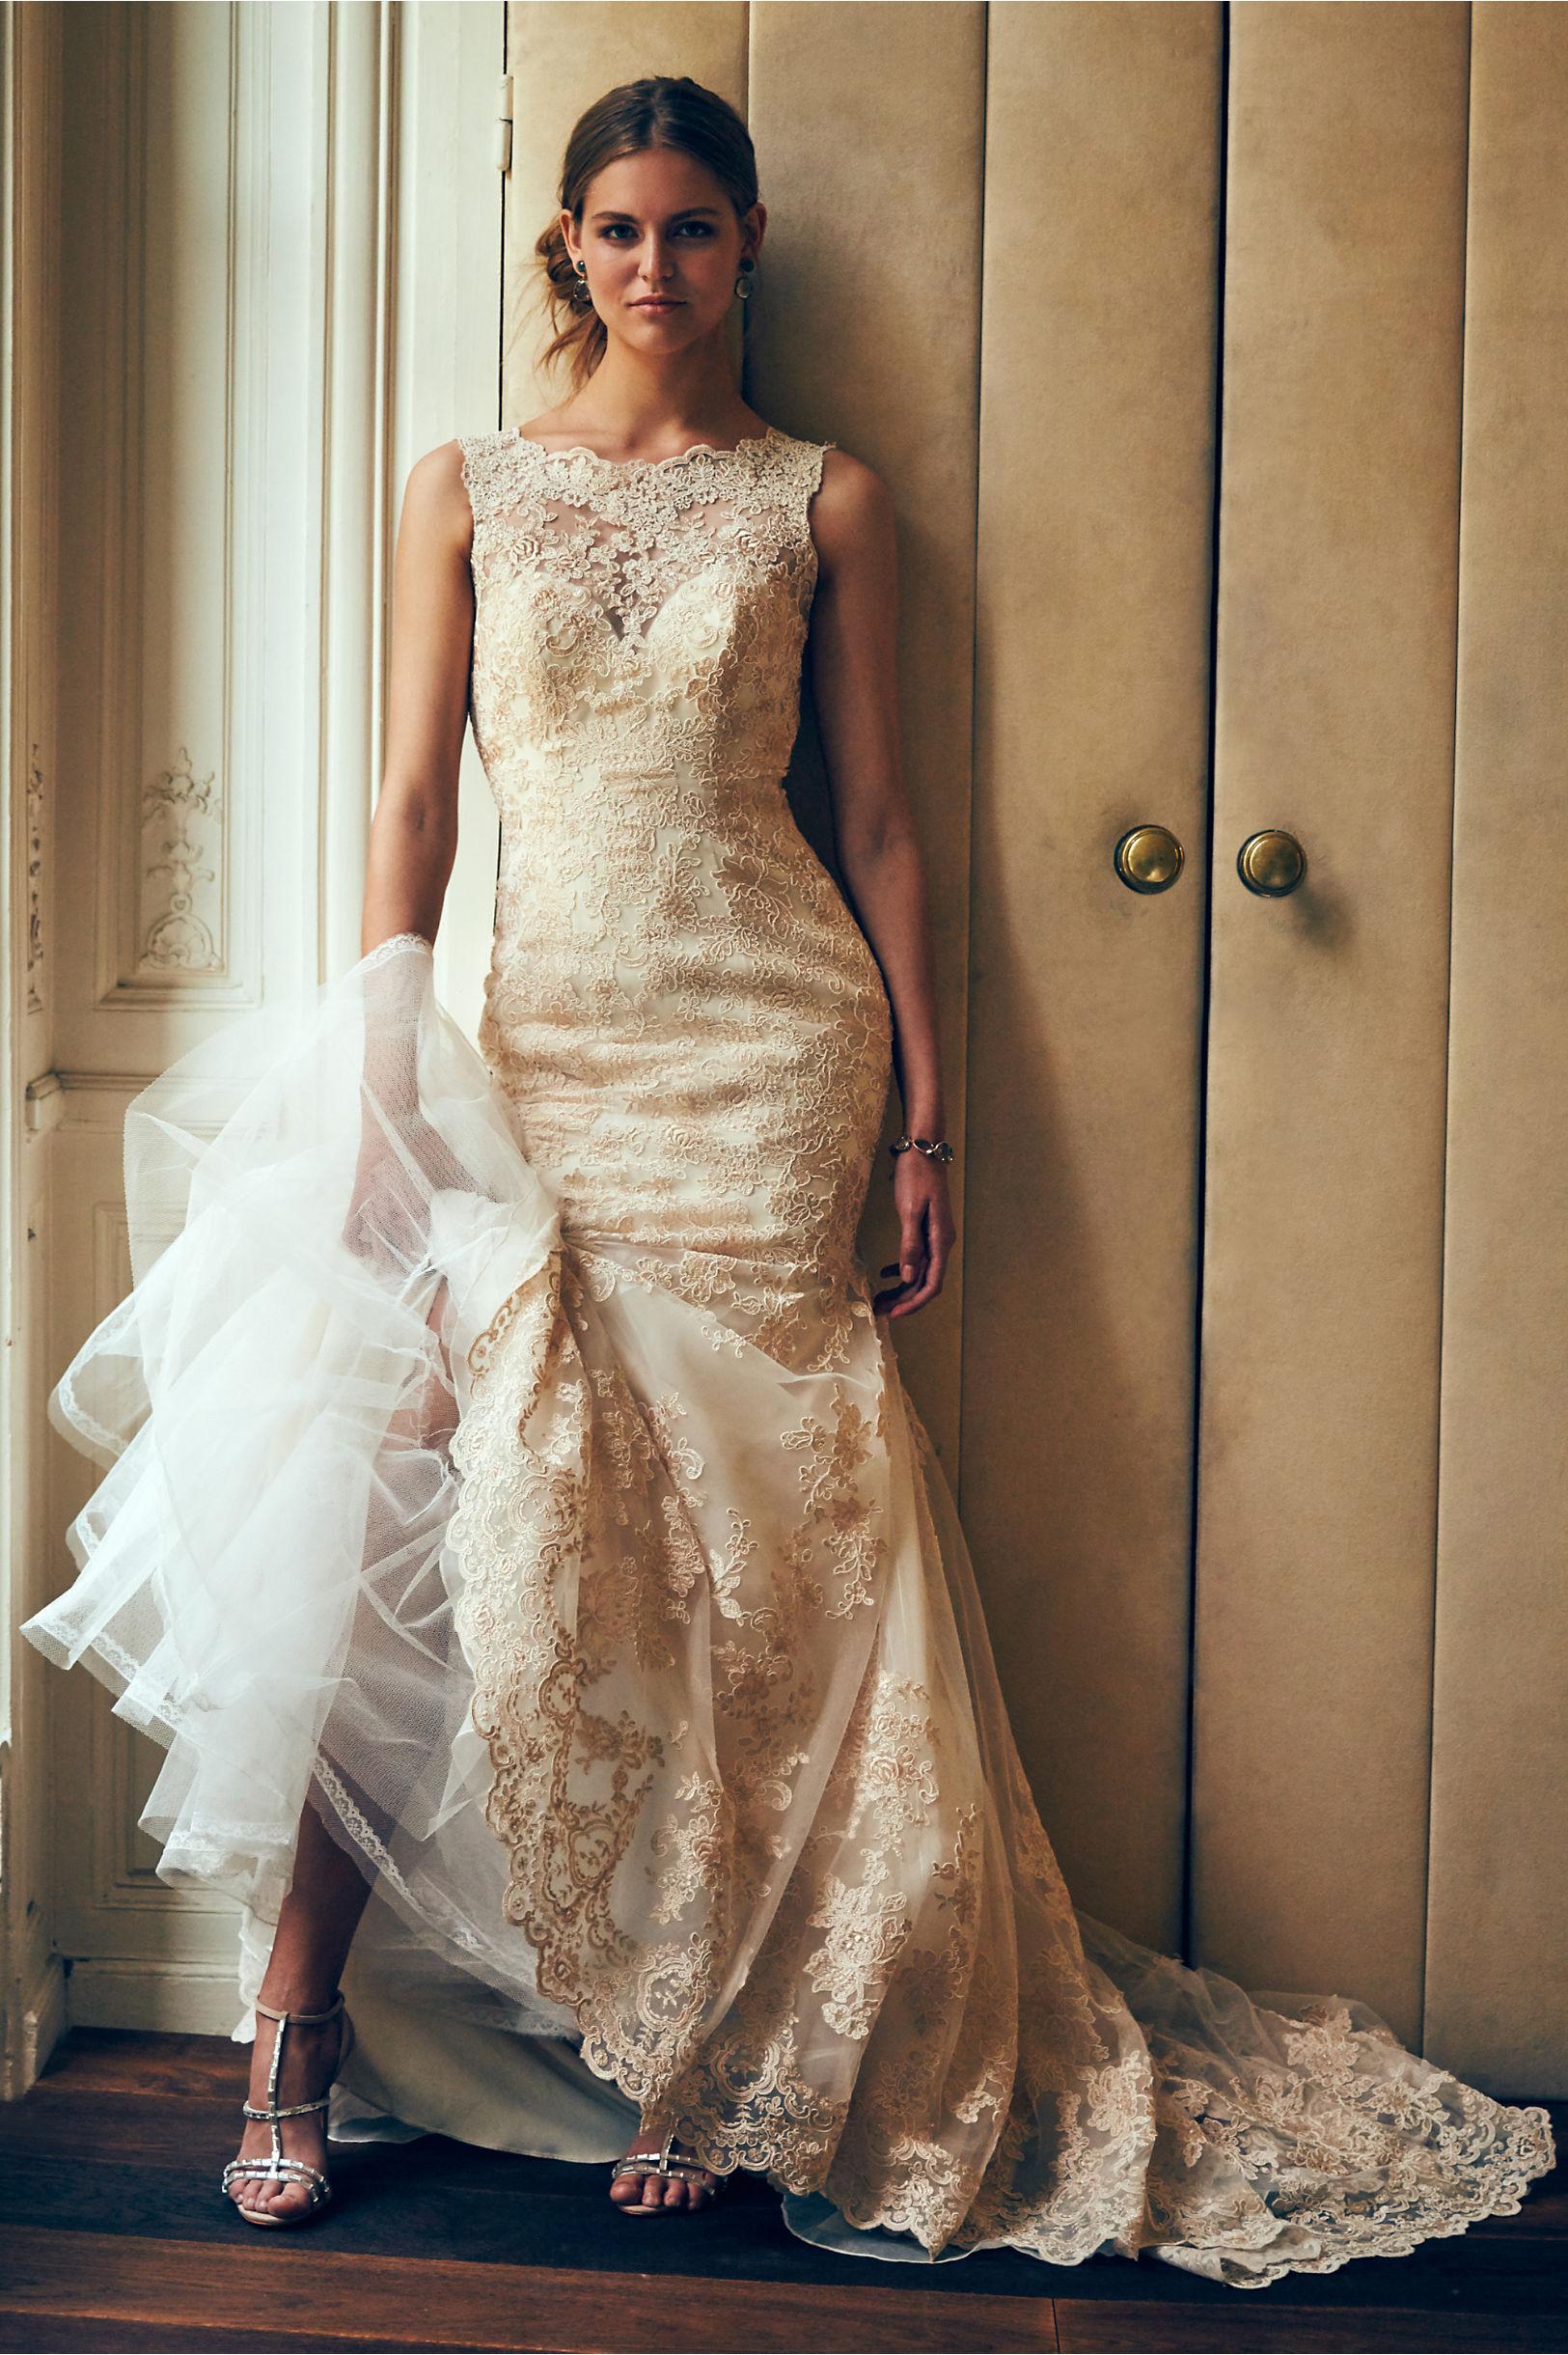 perla gown gold dress for wedding Rose Gold Perla Gown BHLDN